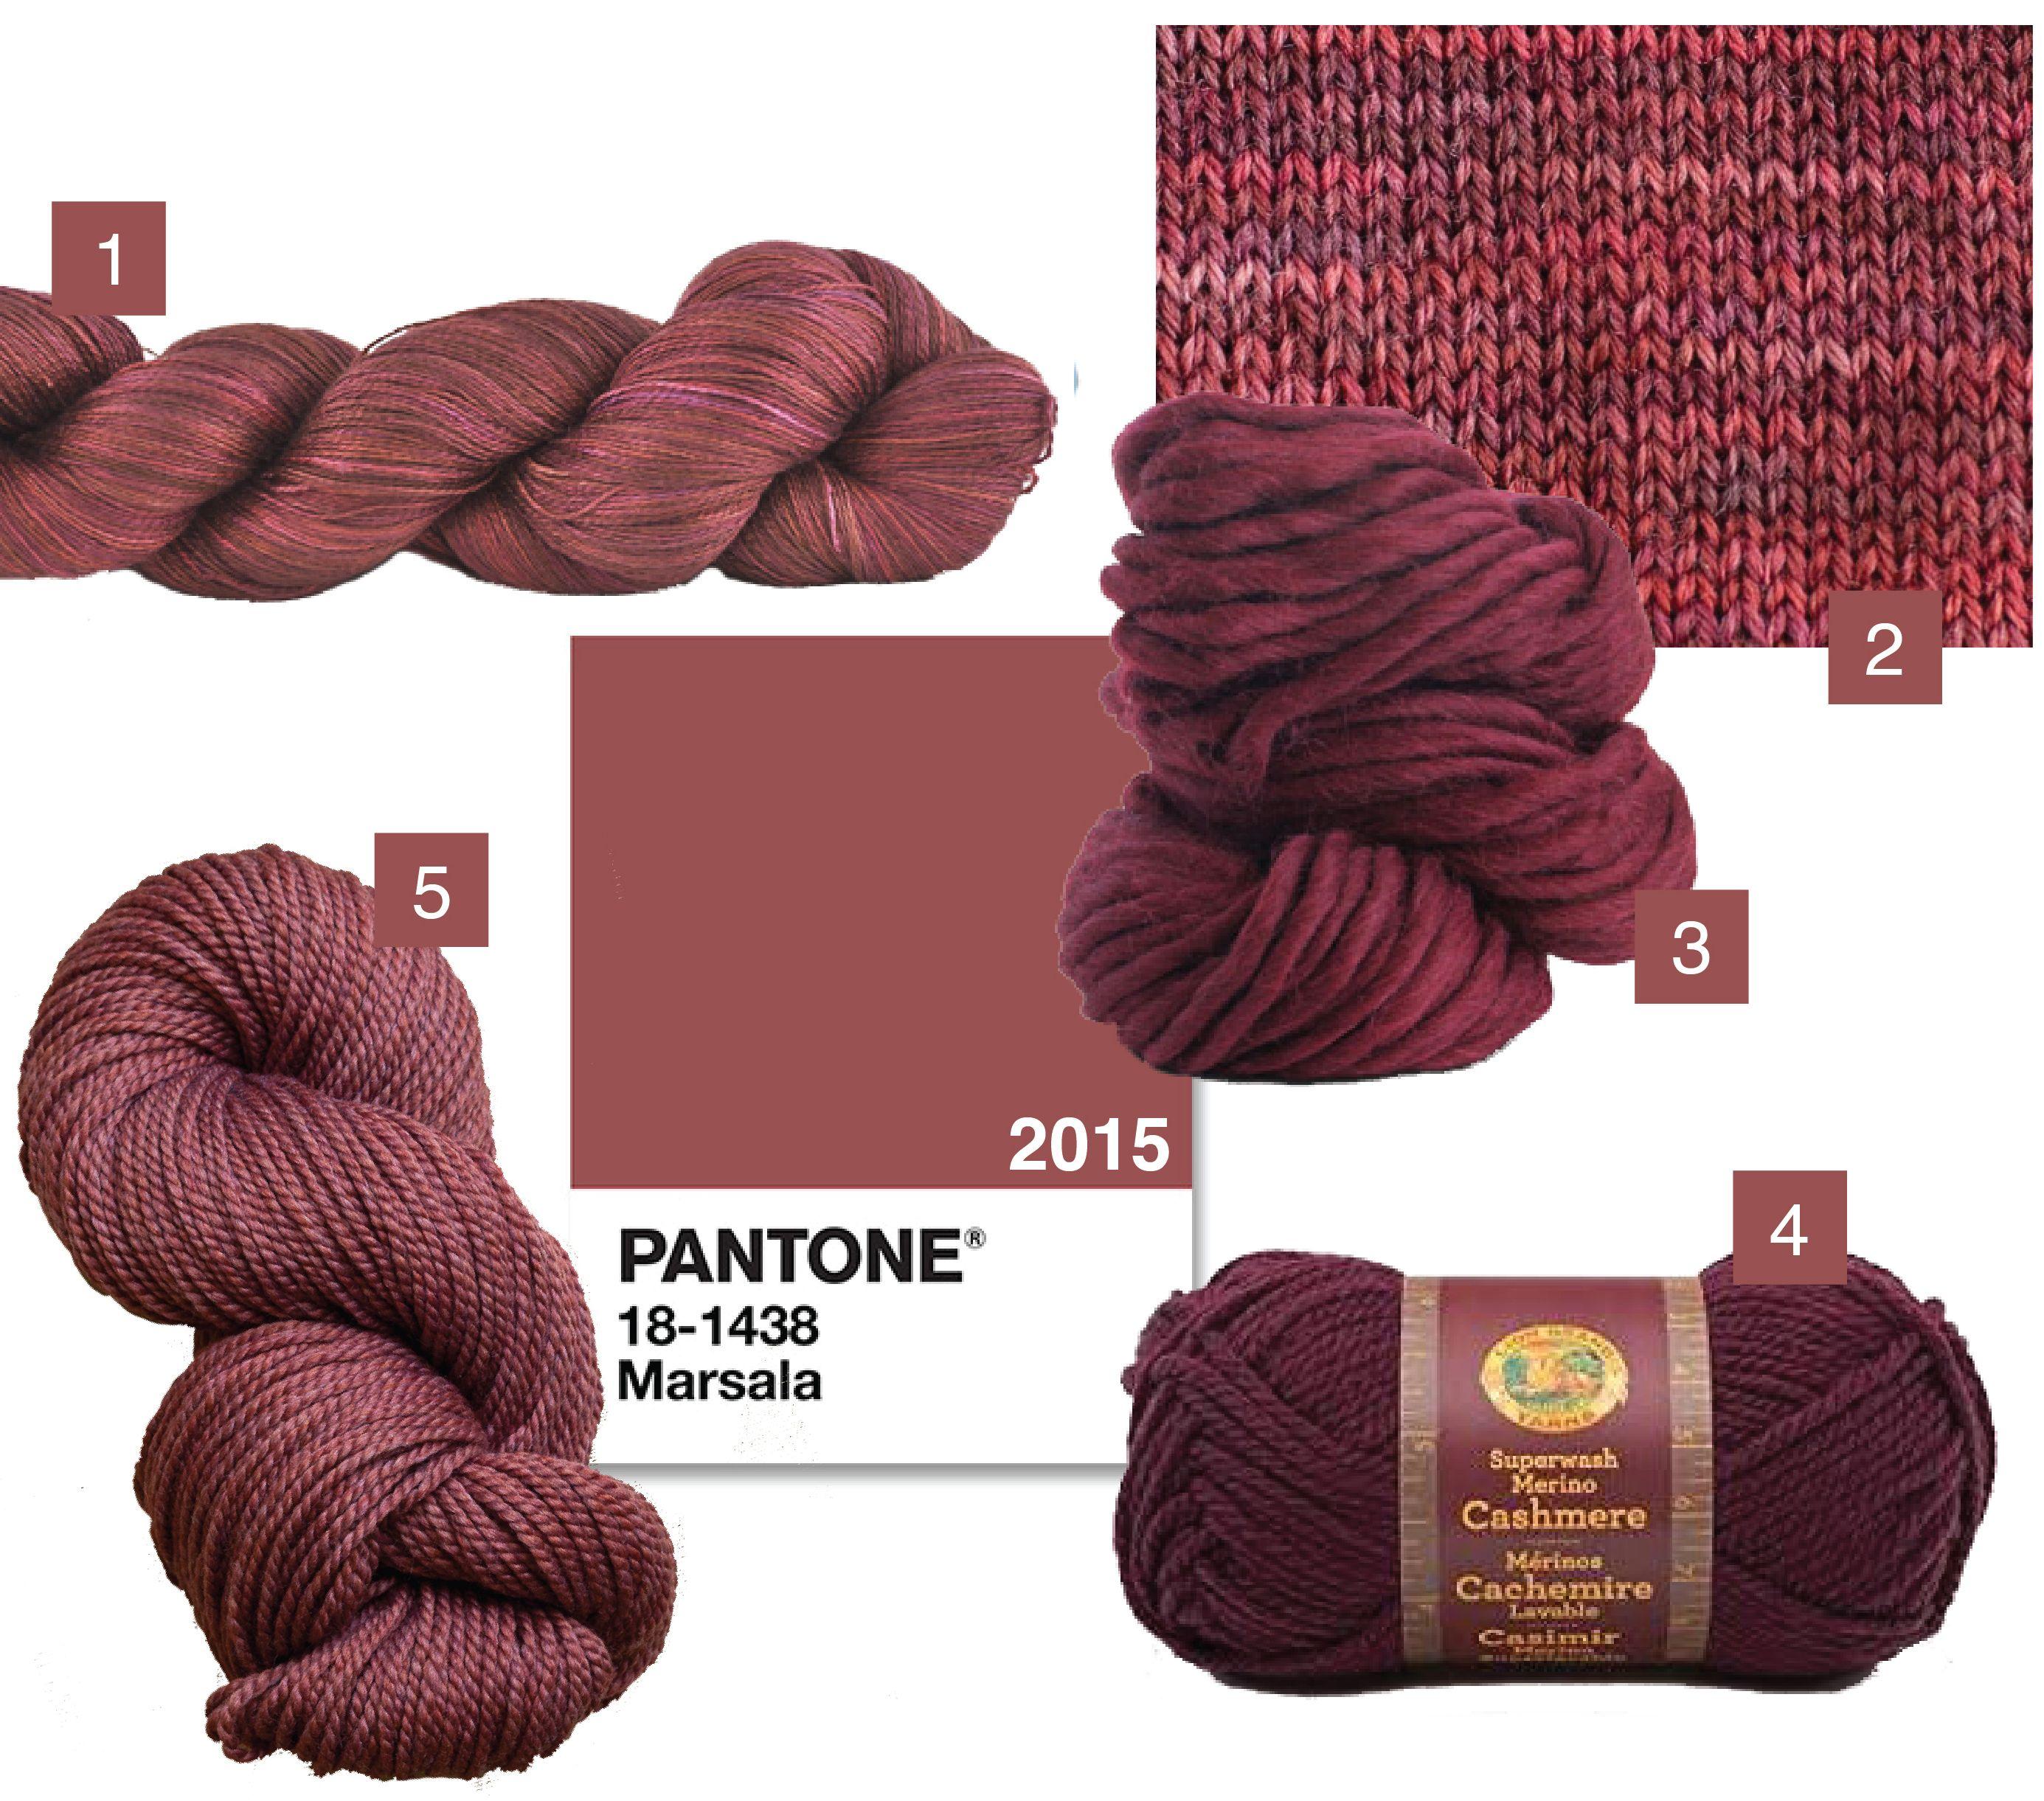 Http Knityorkcity Com Wp Content Uploads 2015 01 Marsala2 Jpg Yarn Knitting Yarn Color